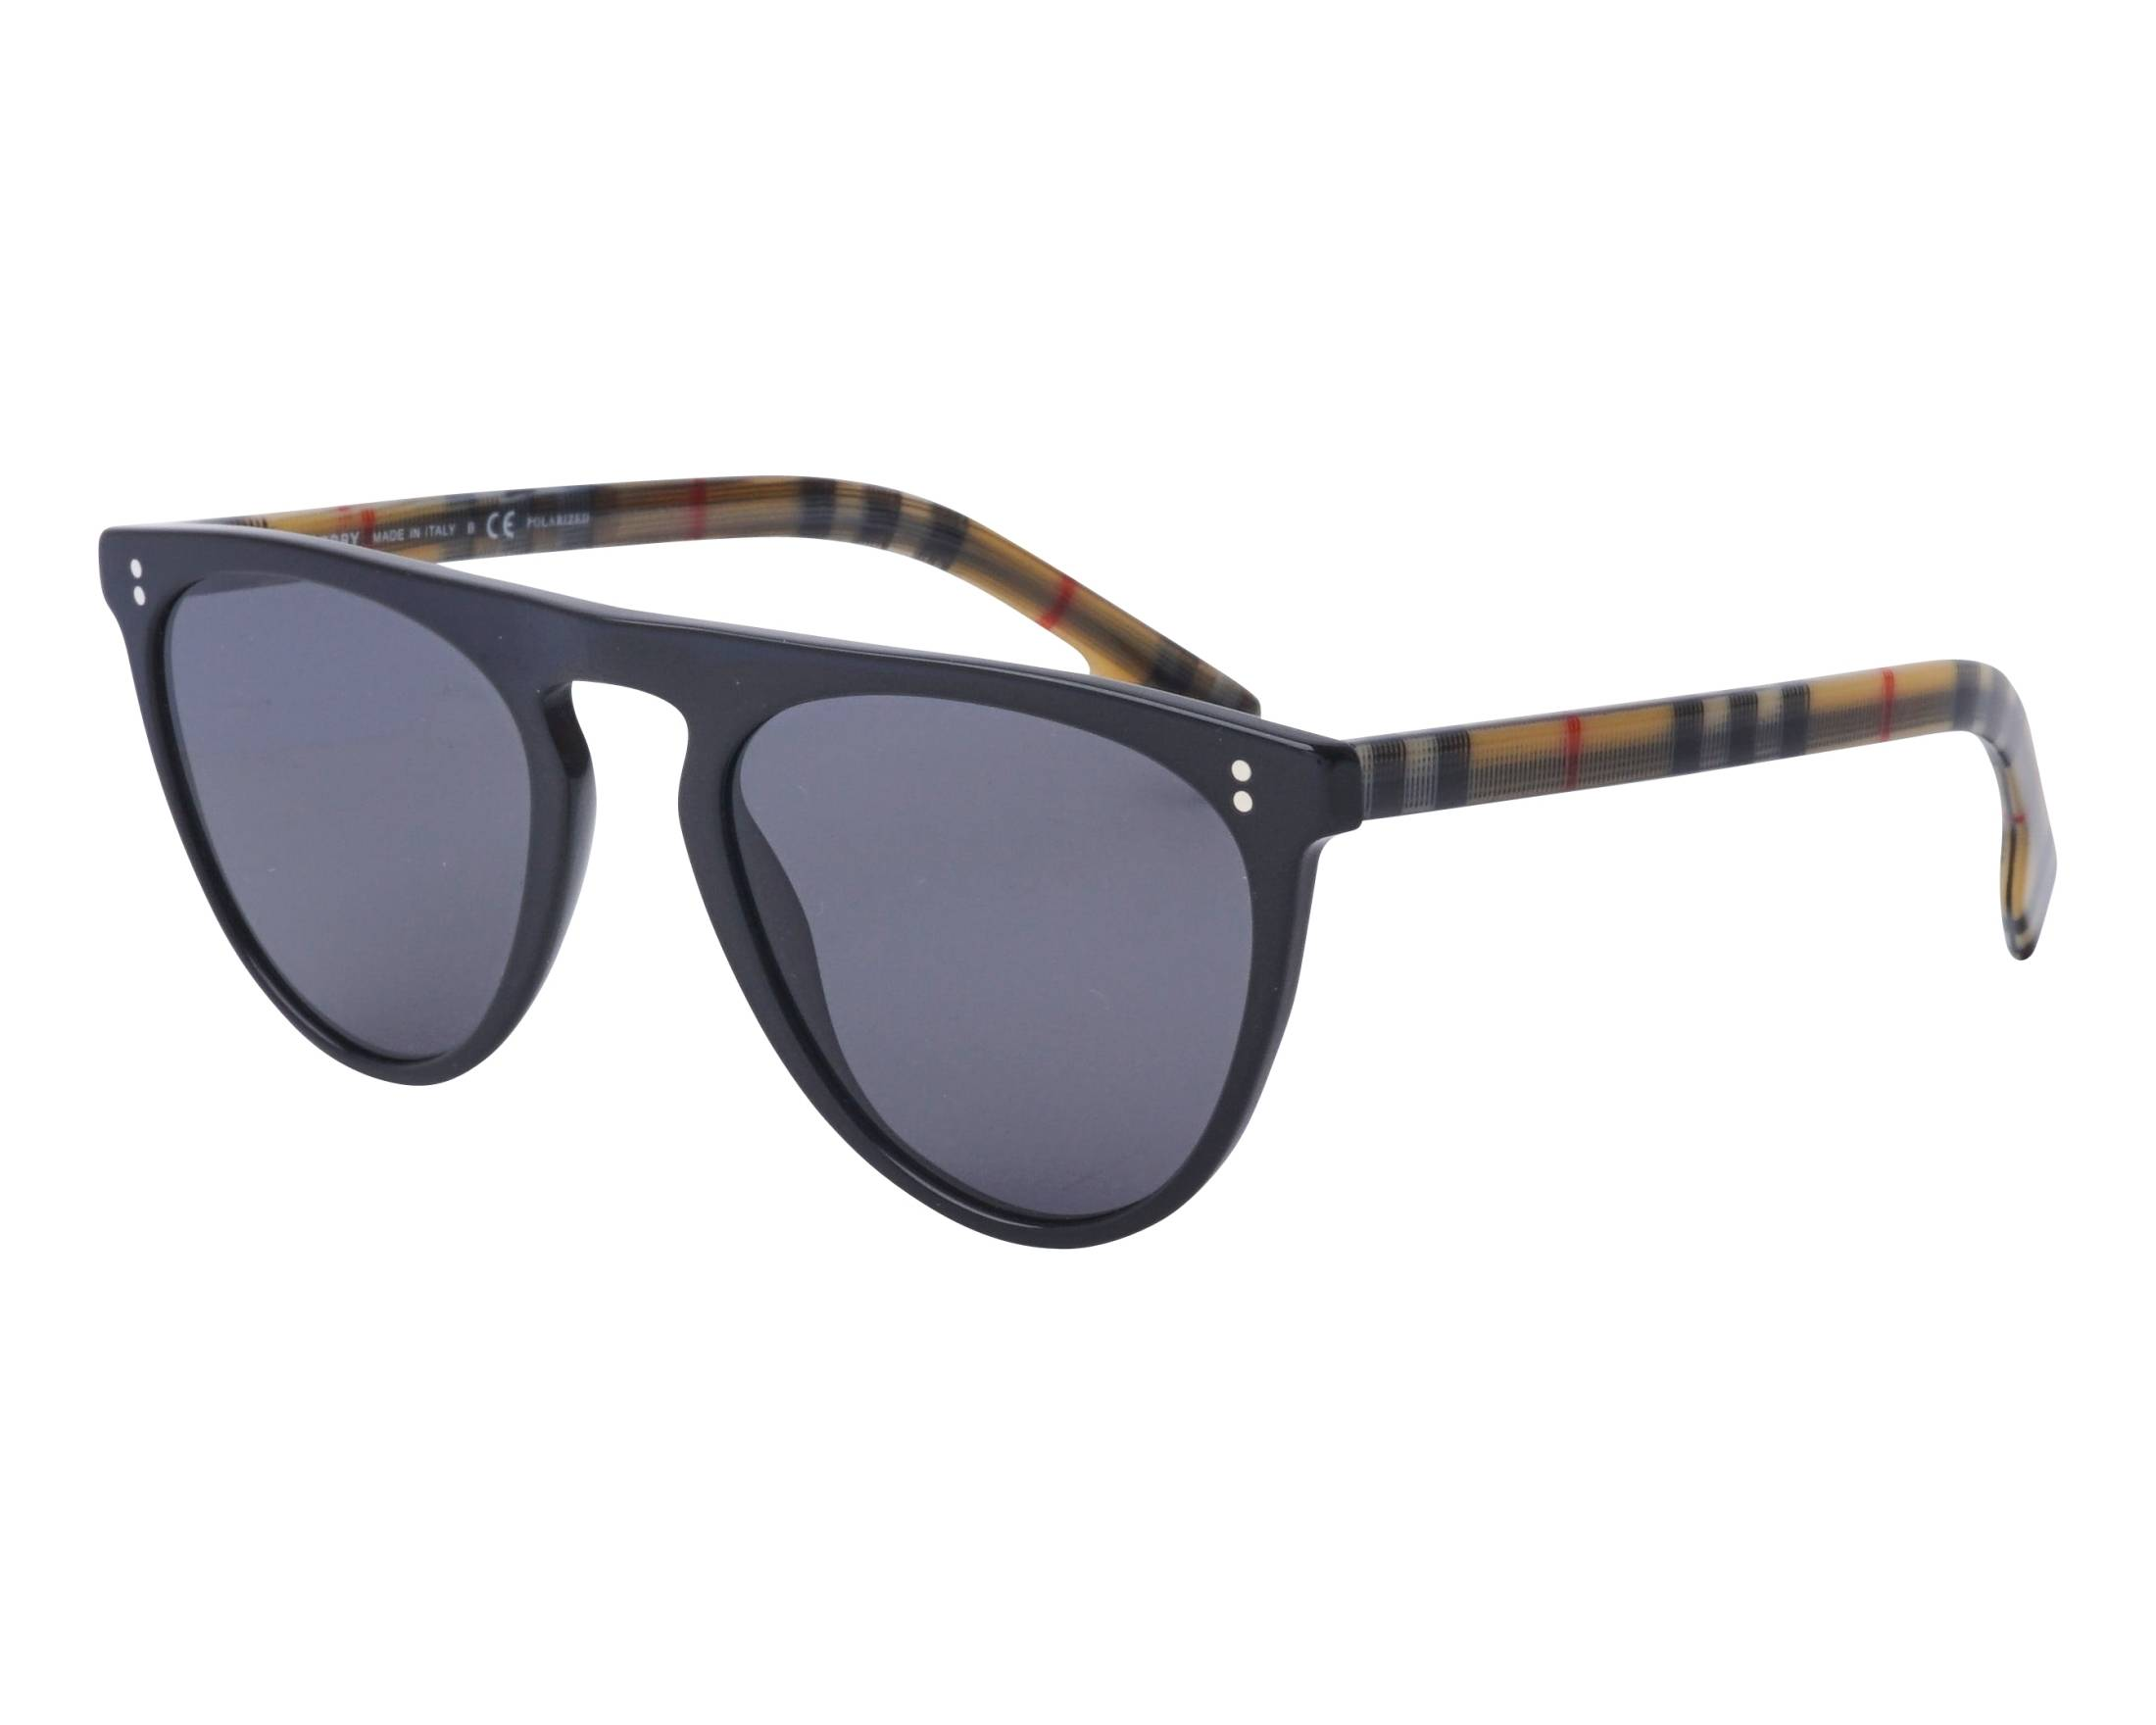 5a46d8fd305e Sunglasses Burberry BE-4281 375781 54-21 Black Beige profile view